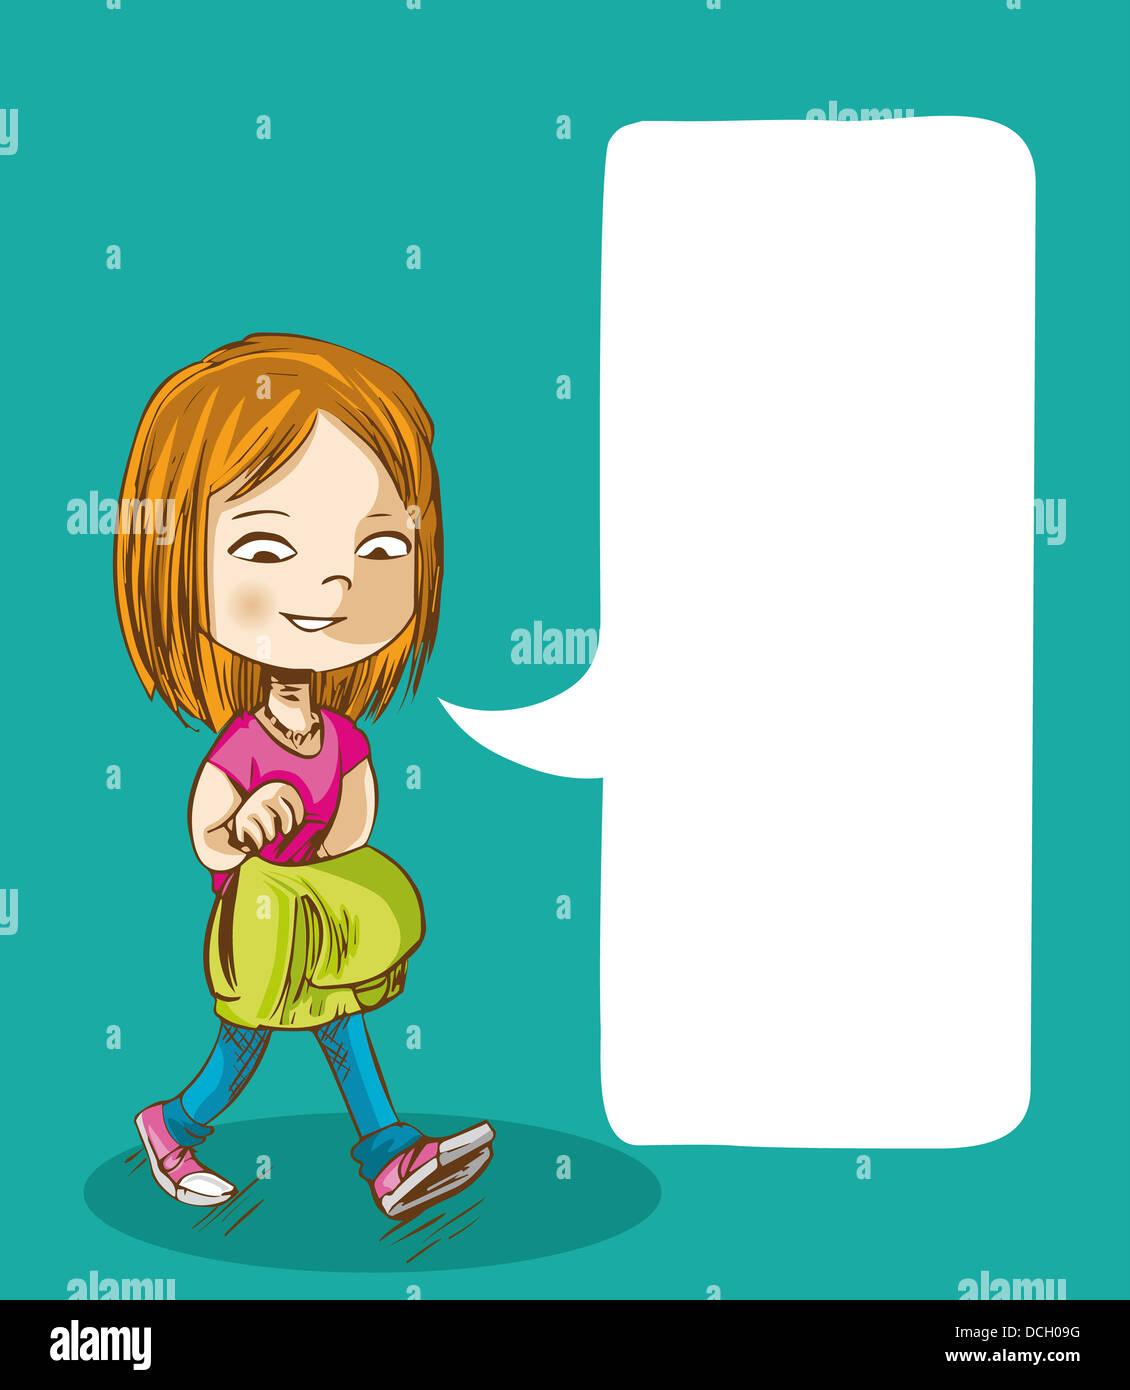 Education Cartoon Girl Walking Back To School With Social Media Stock Photo Alamy